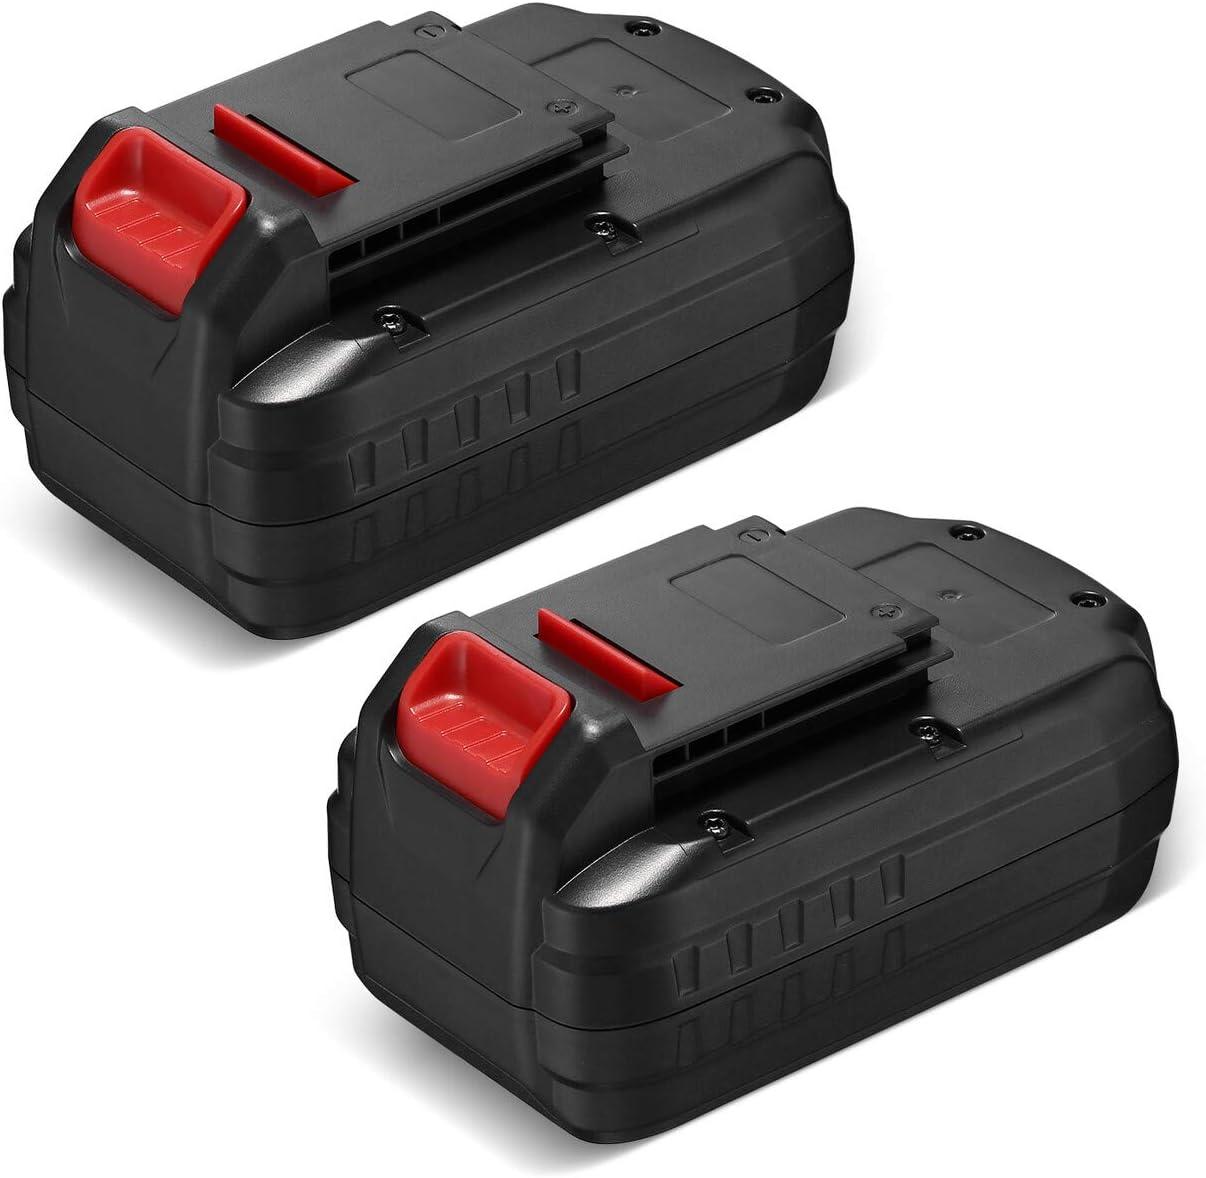 Dutyone 2 Pack 3700mAh Replacement Battery Compatible with Porter Cable 18V Cordless Power Tools PC18B Ni-CD PCC489N PCMVC PCXMVC PCC489N PC18BL PC18BLX PC18BLEX PC18B-2 18-Volt Batteries